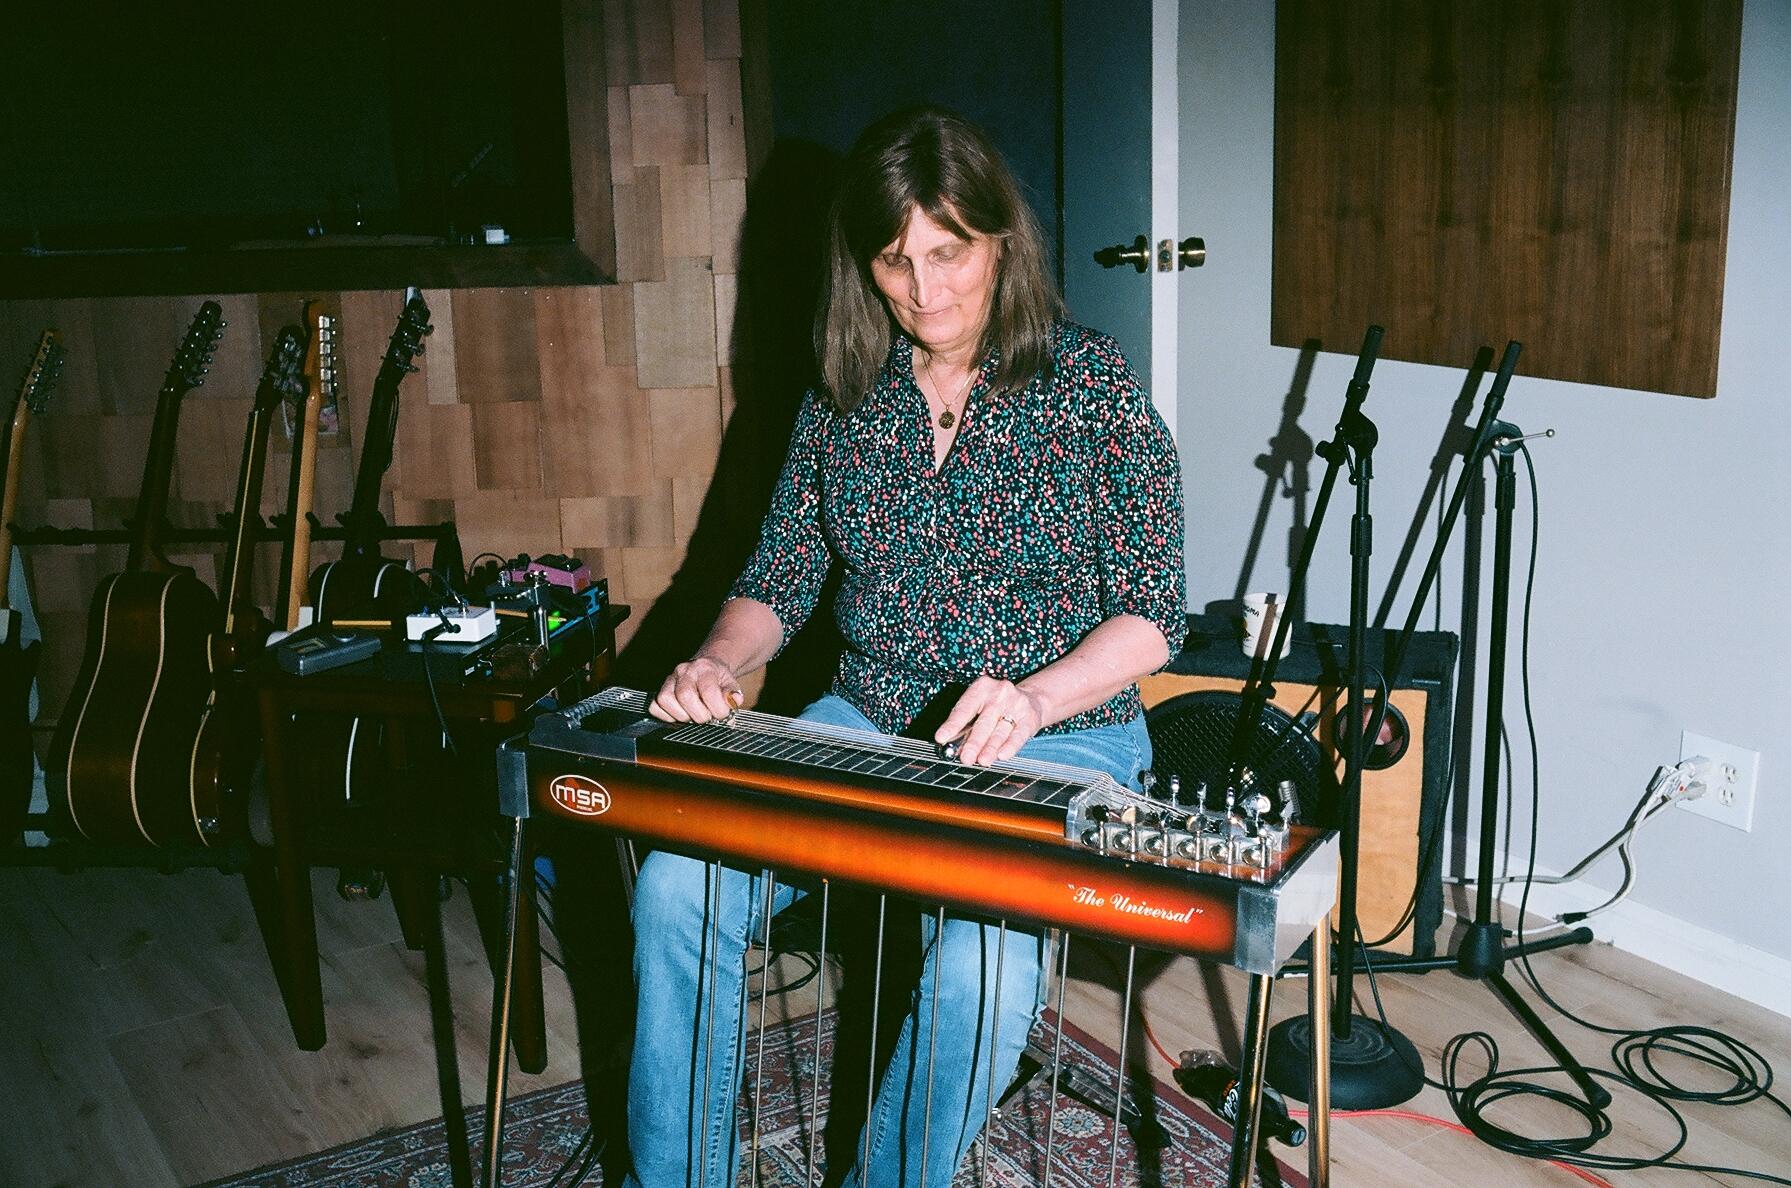 Pedal Steel Guitarist Susan Alcorn (Photo by Devin O'Brien)